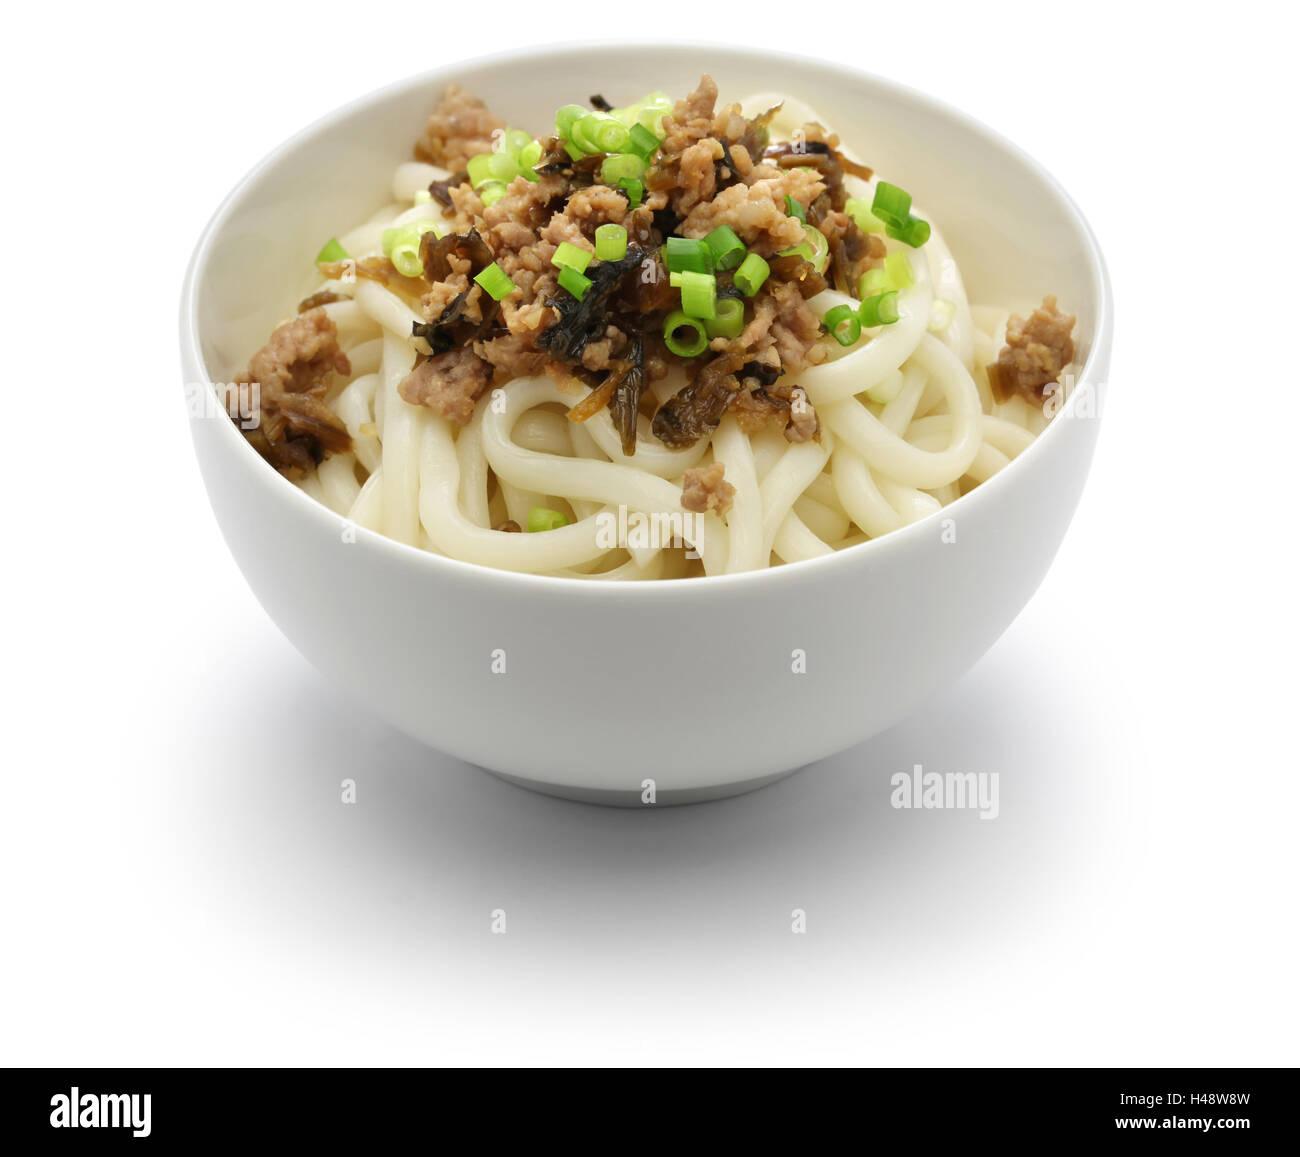 dan dan noodles, chinese sichuan cuisine, before mix - Stock Image